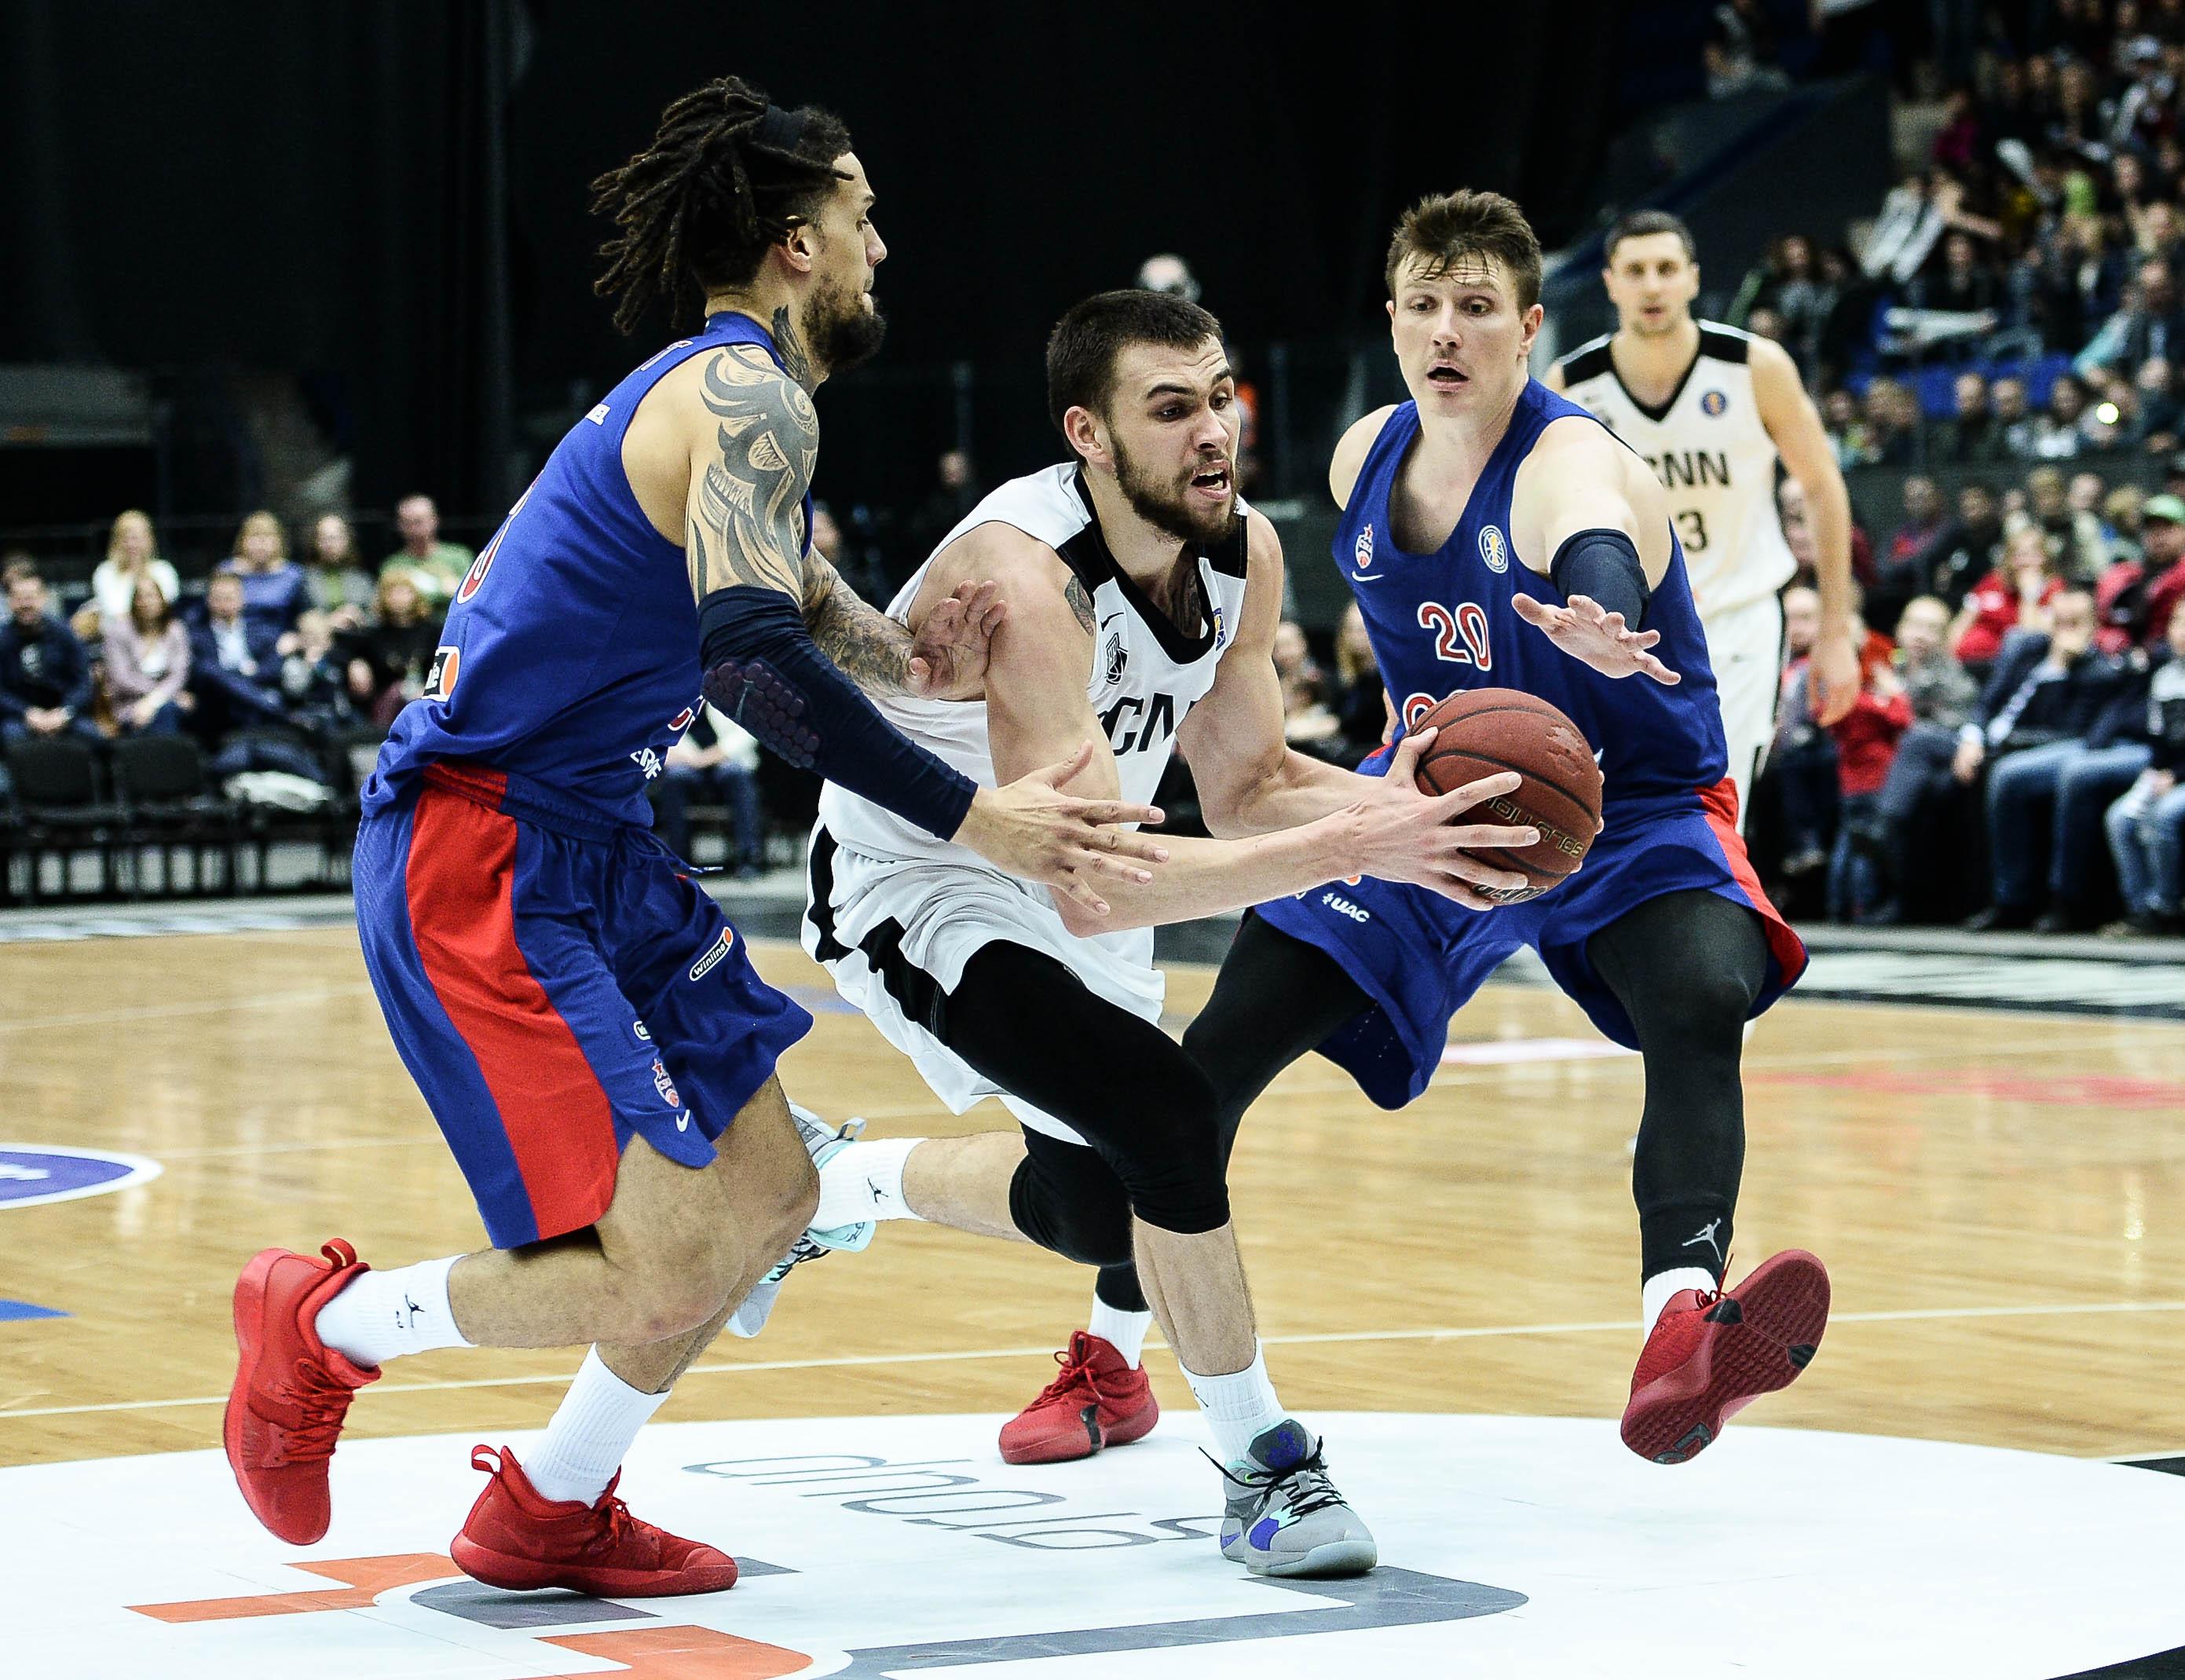 Week 24 In Review: Zhbanov Goes Off vs. CSKA, Kulagin's Dunks Save Loko